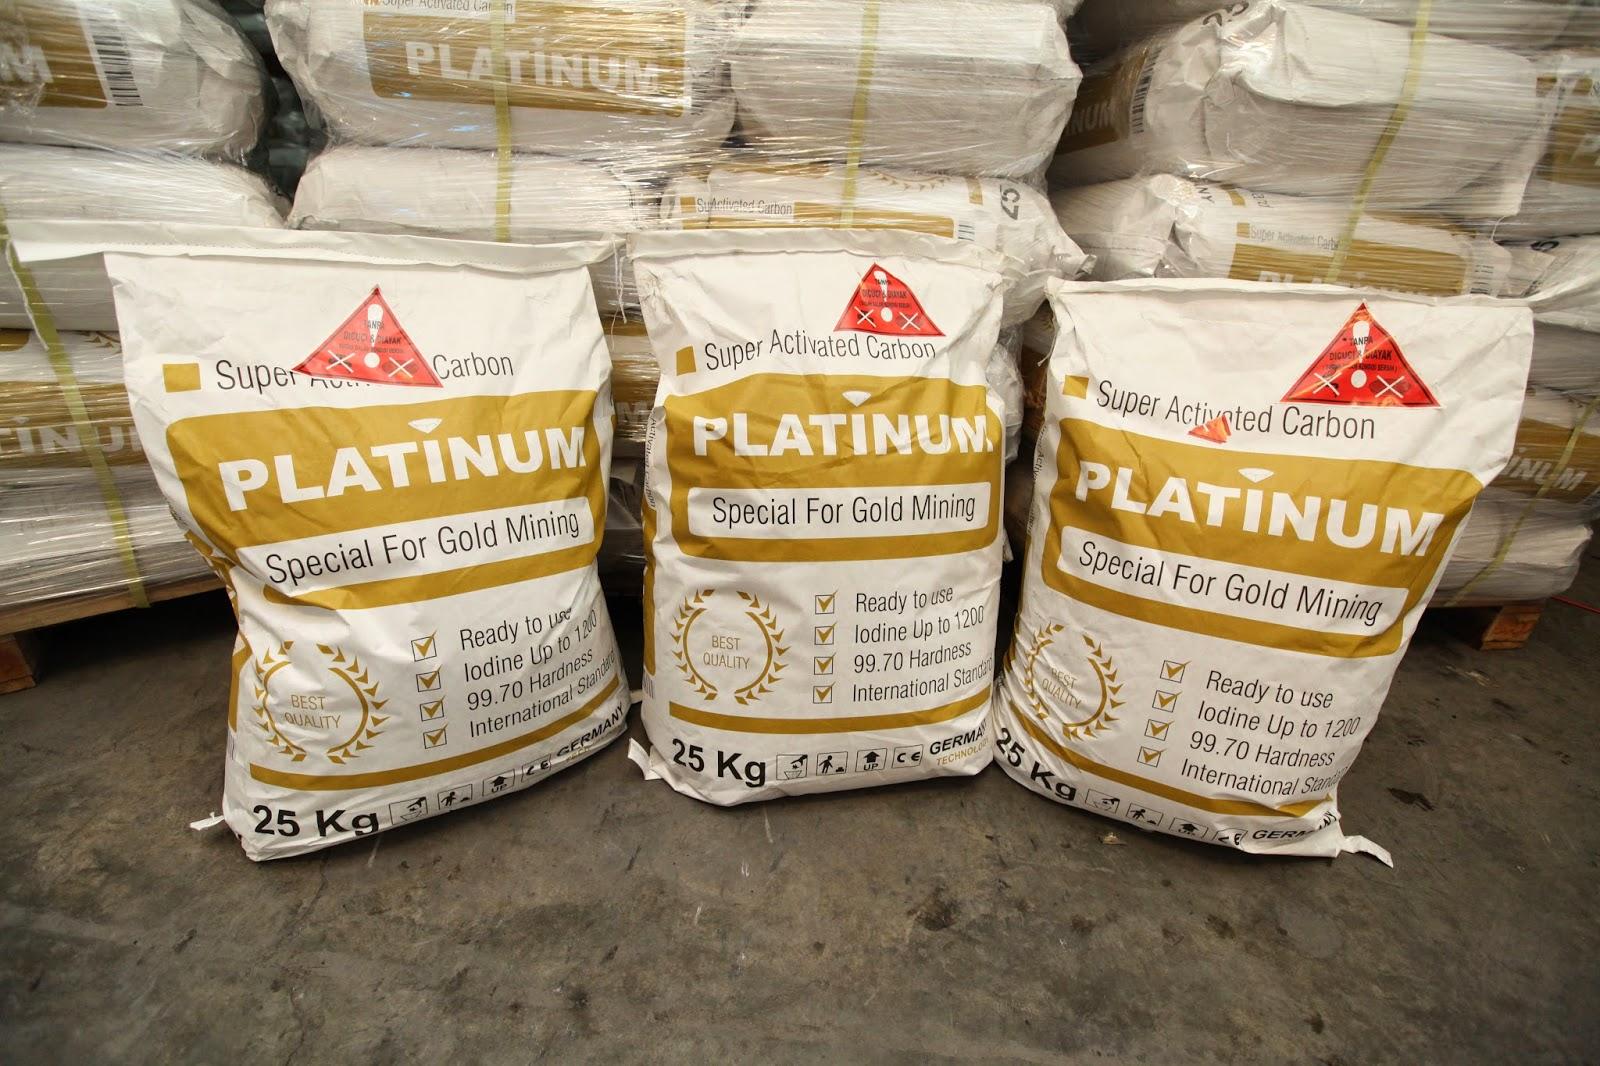 www.intialamkimia.com - distributor jual karbon aktif platinum